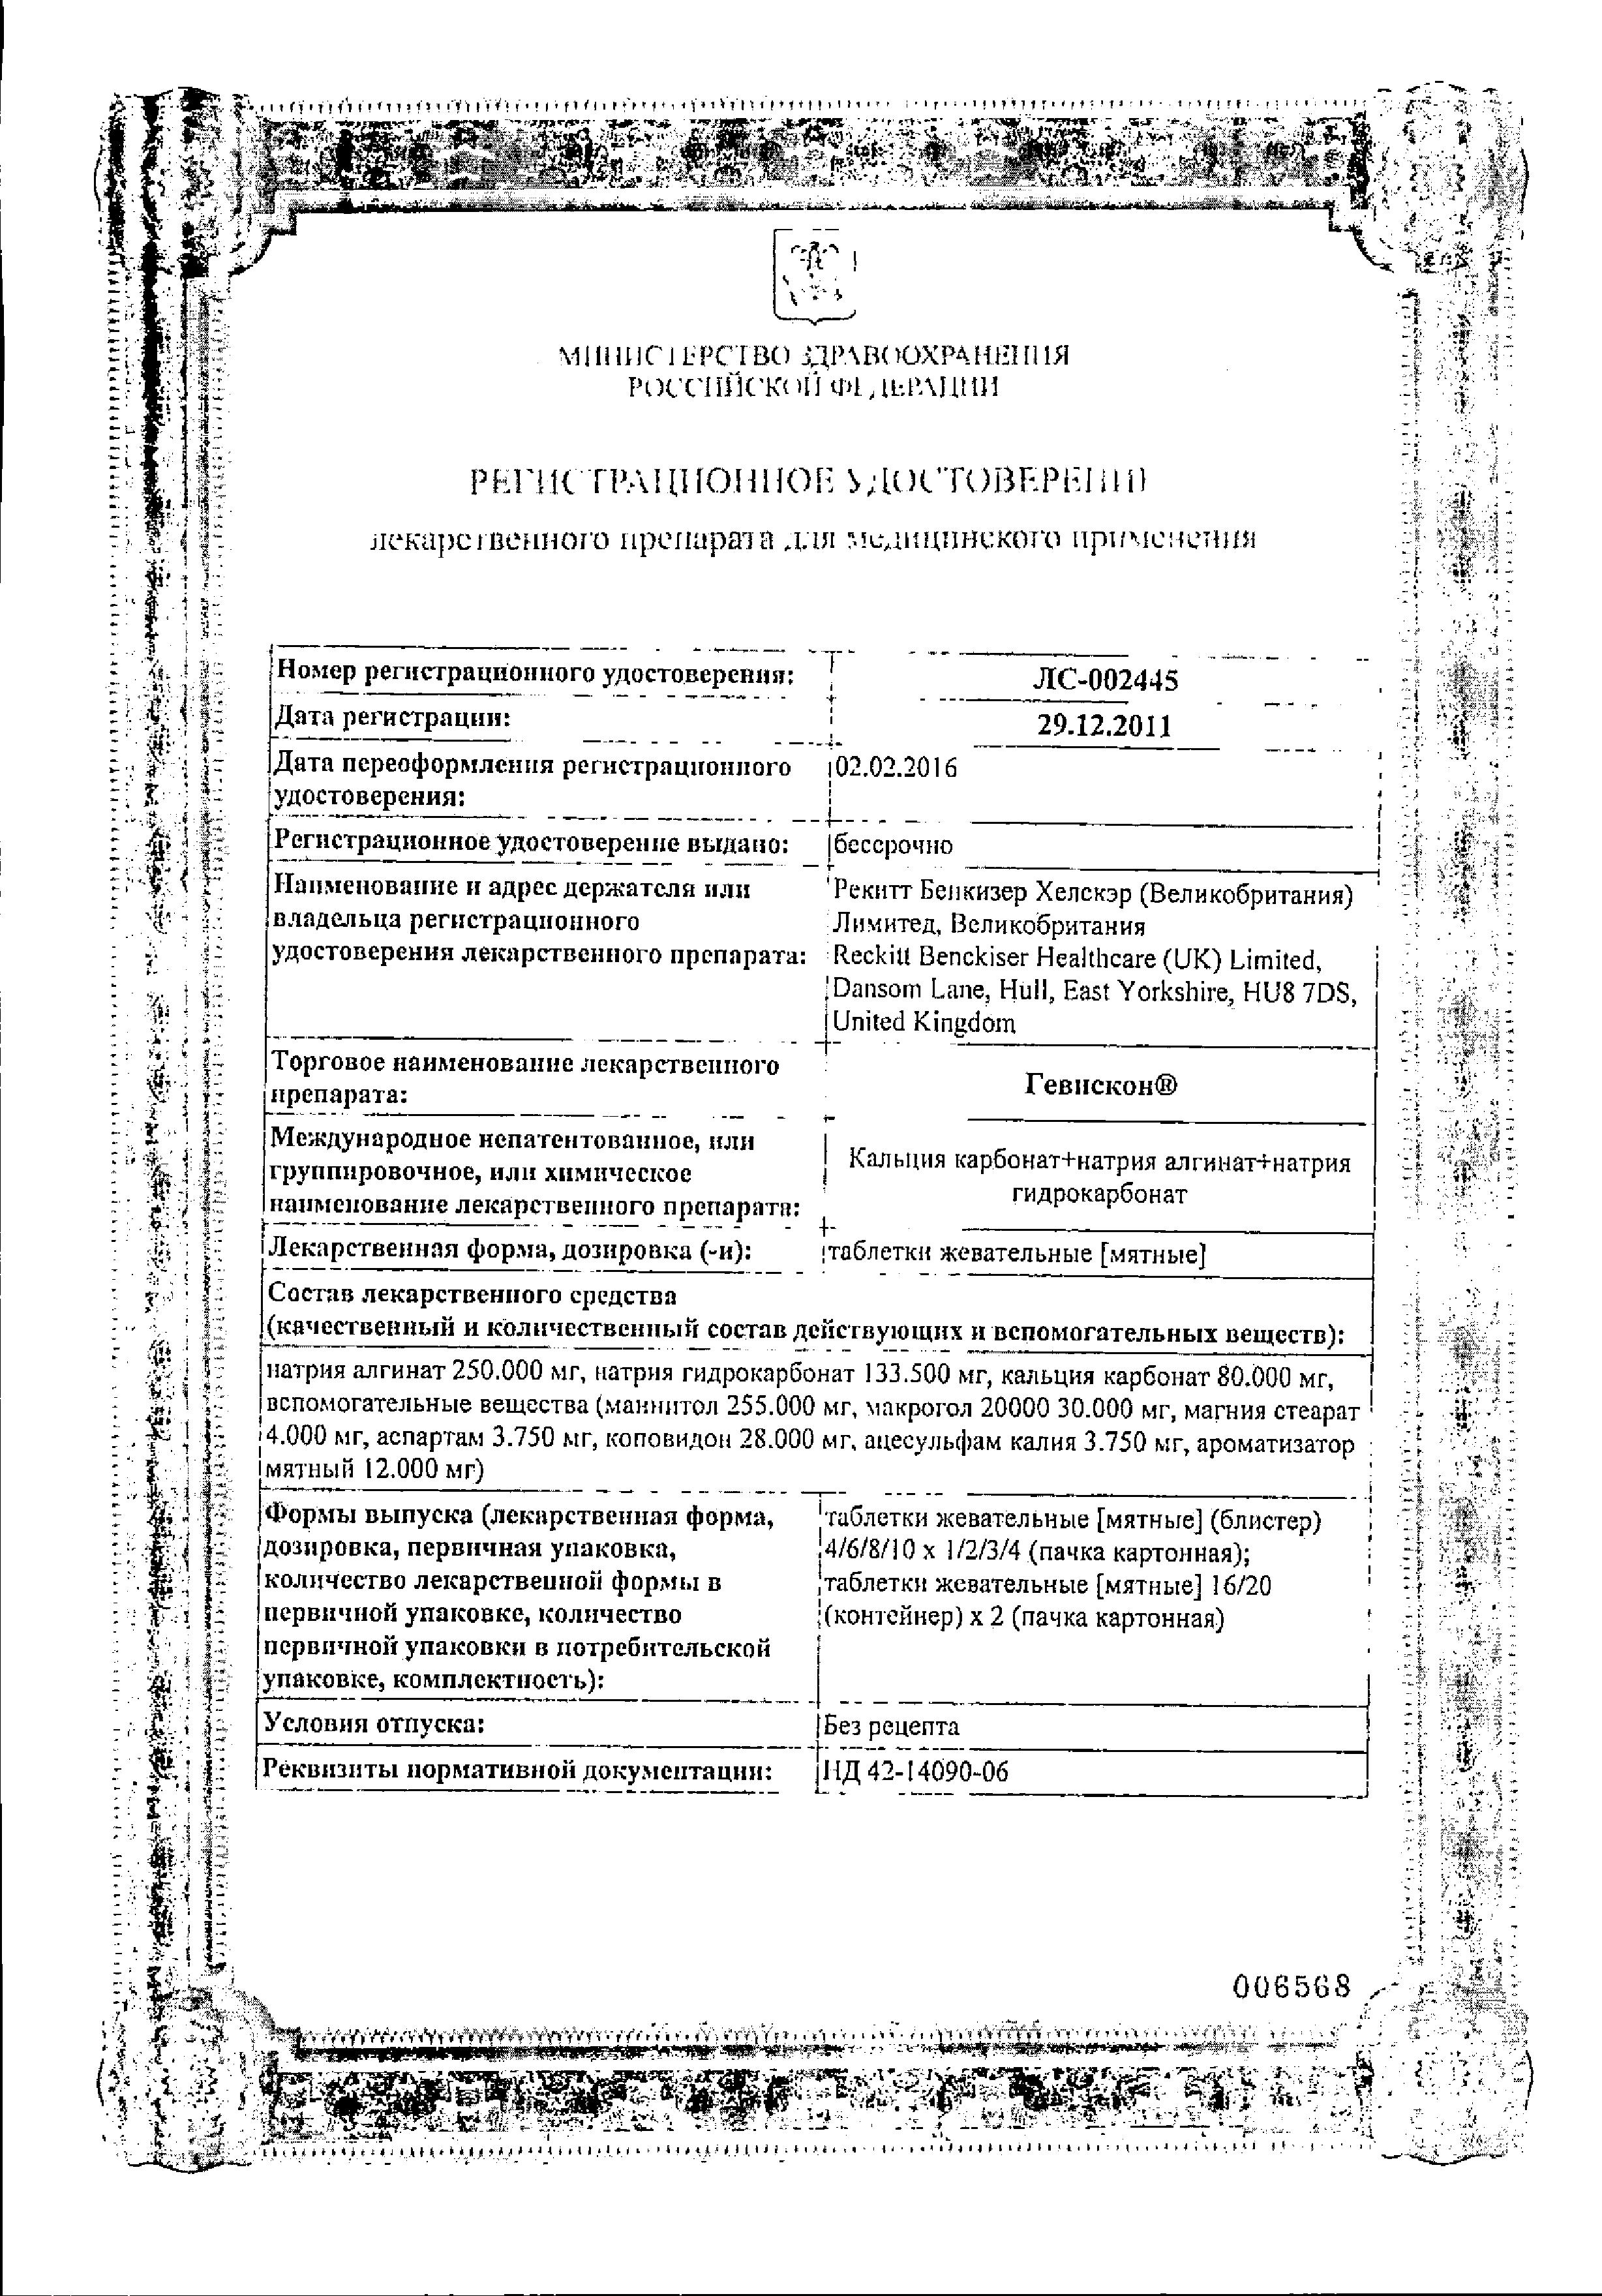 Гевискон сертификат